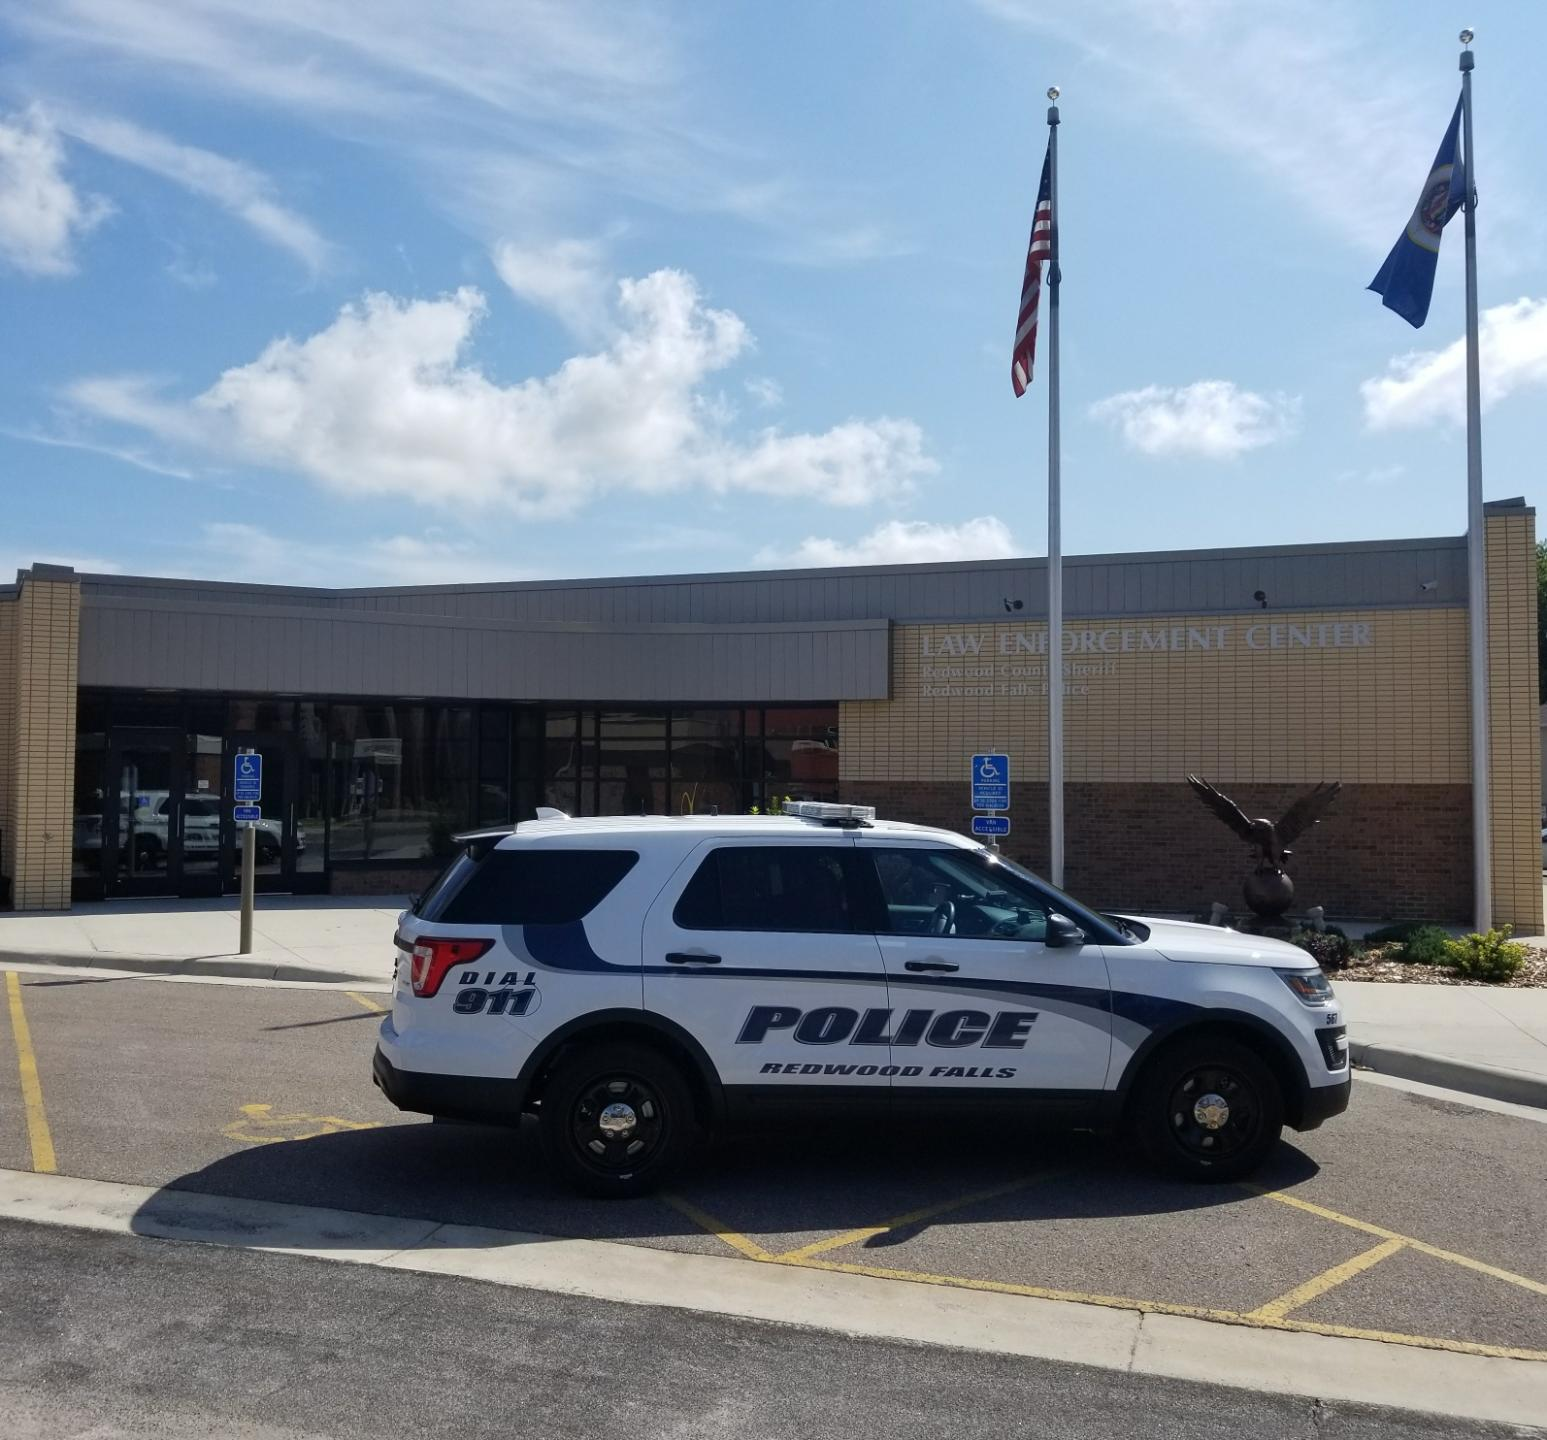 REDWOOD FALLS POLICE DEPARTMENT -